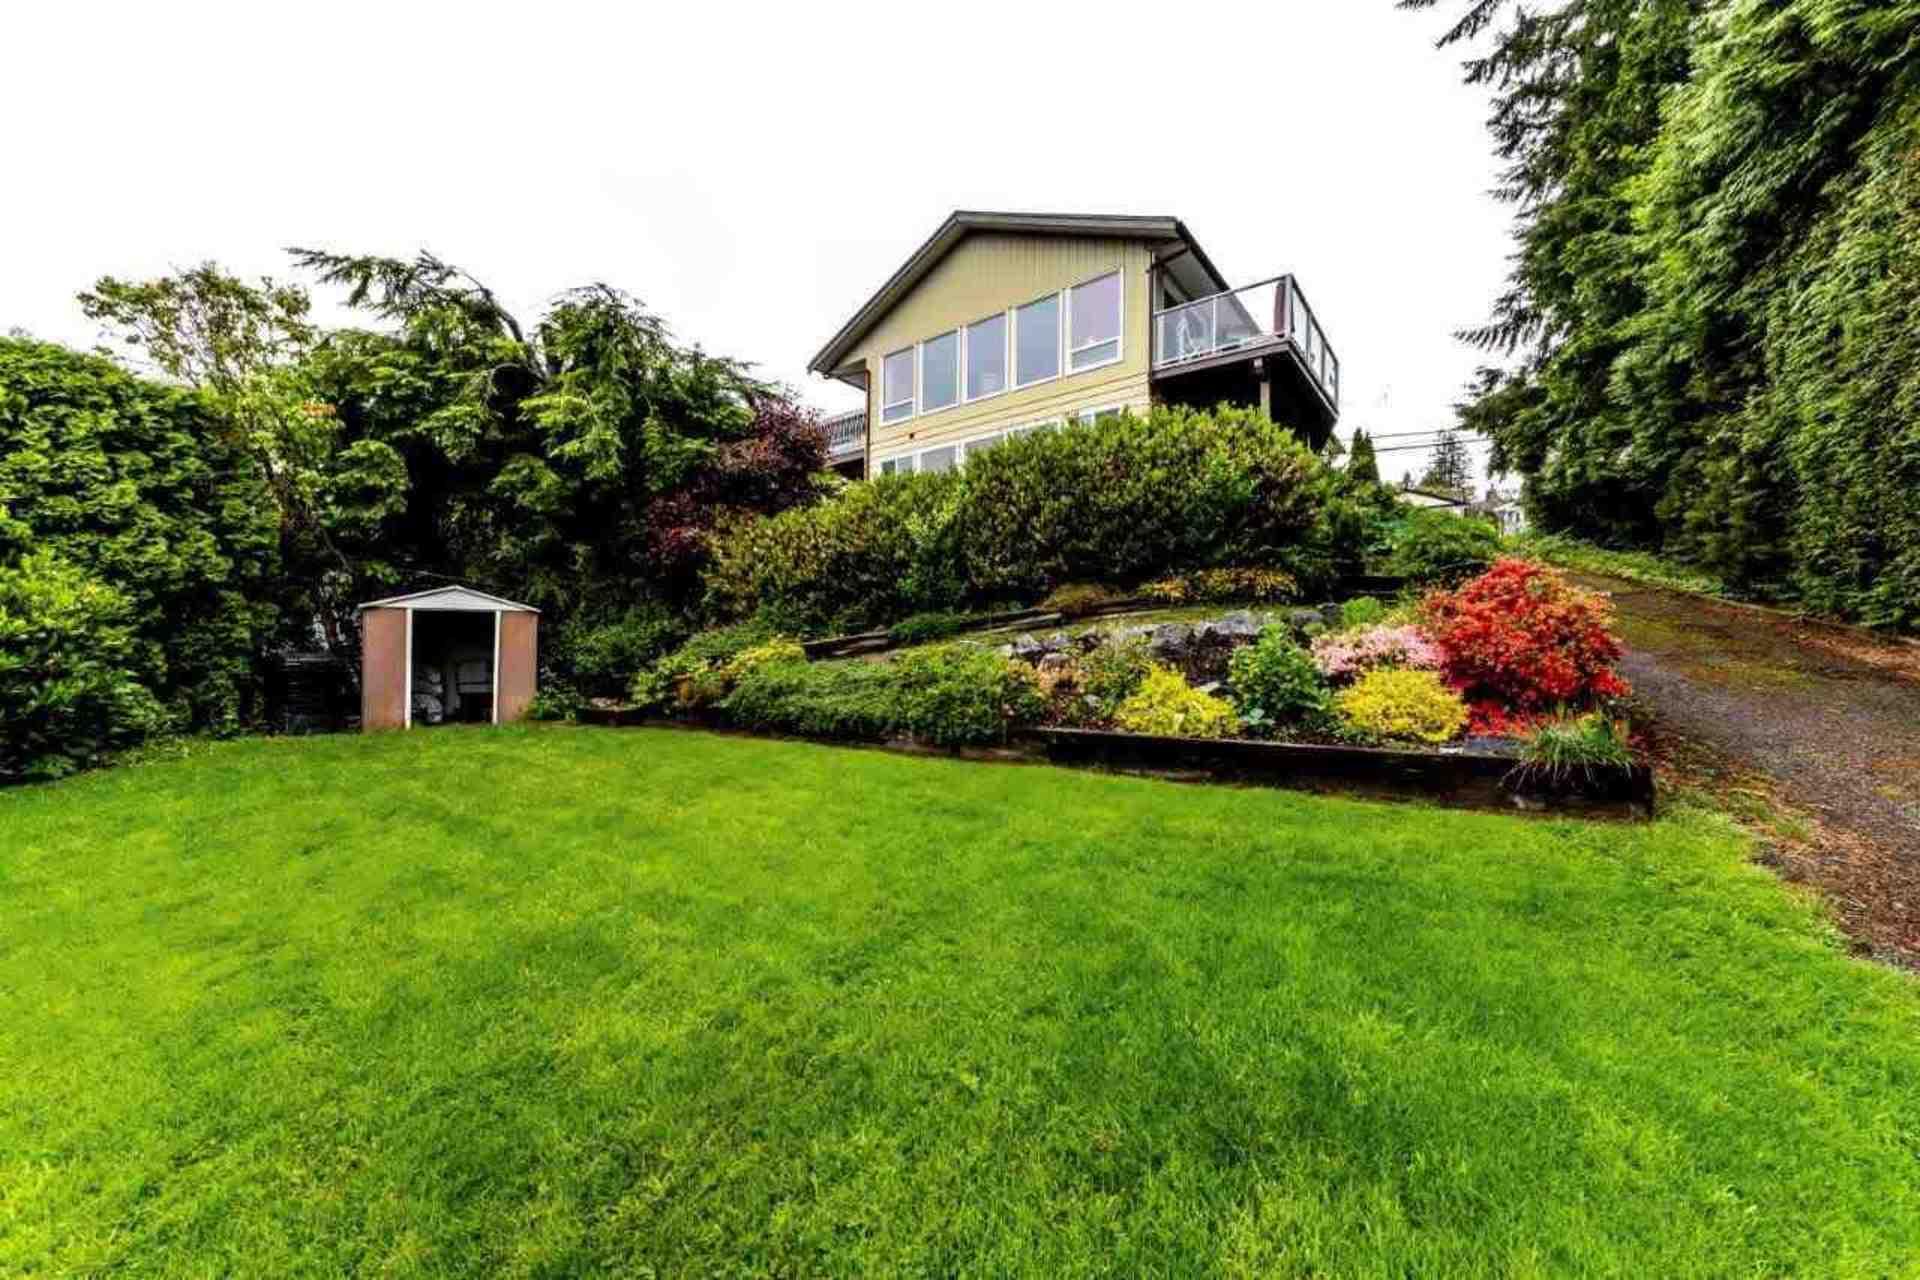 3863-st-pauls-avenue-upper-lonsdale-north-vancouver-20 at 3863 St. Pauls Avenue, Upper Lonsdale, North Vancouver